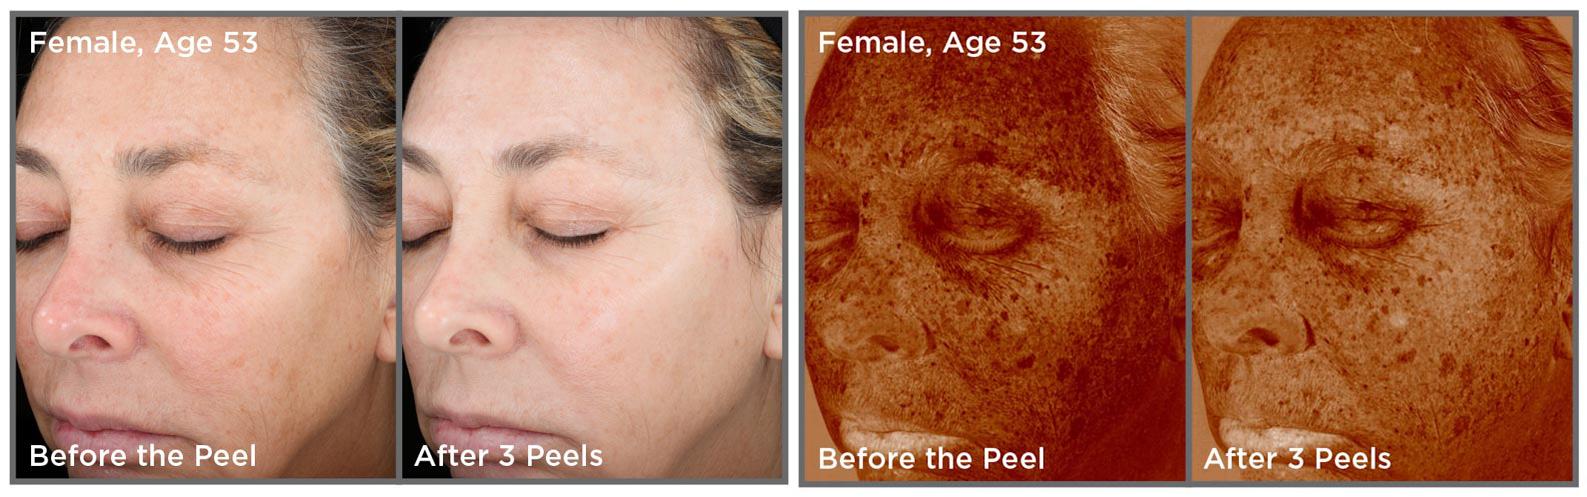 Vitalize Peel | Dr. Shaun Parson Plastic Surgery and Skin Center | Scottsdale, Arizona